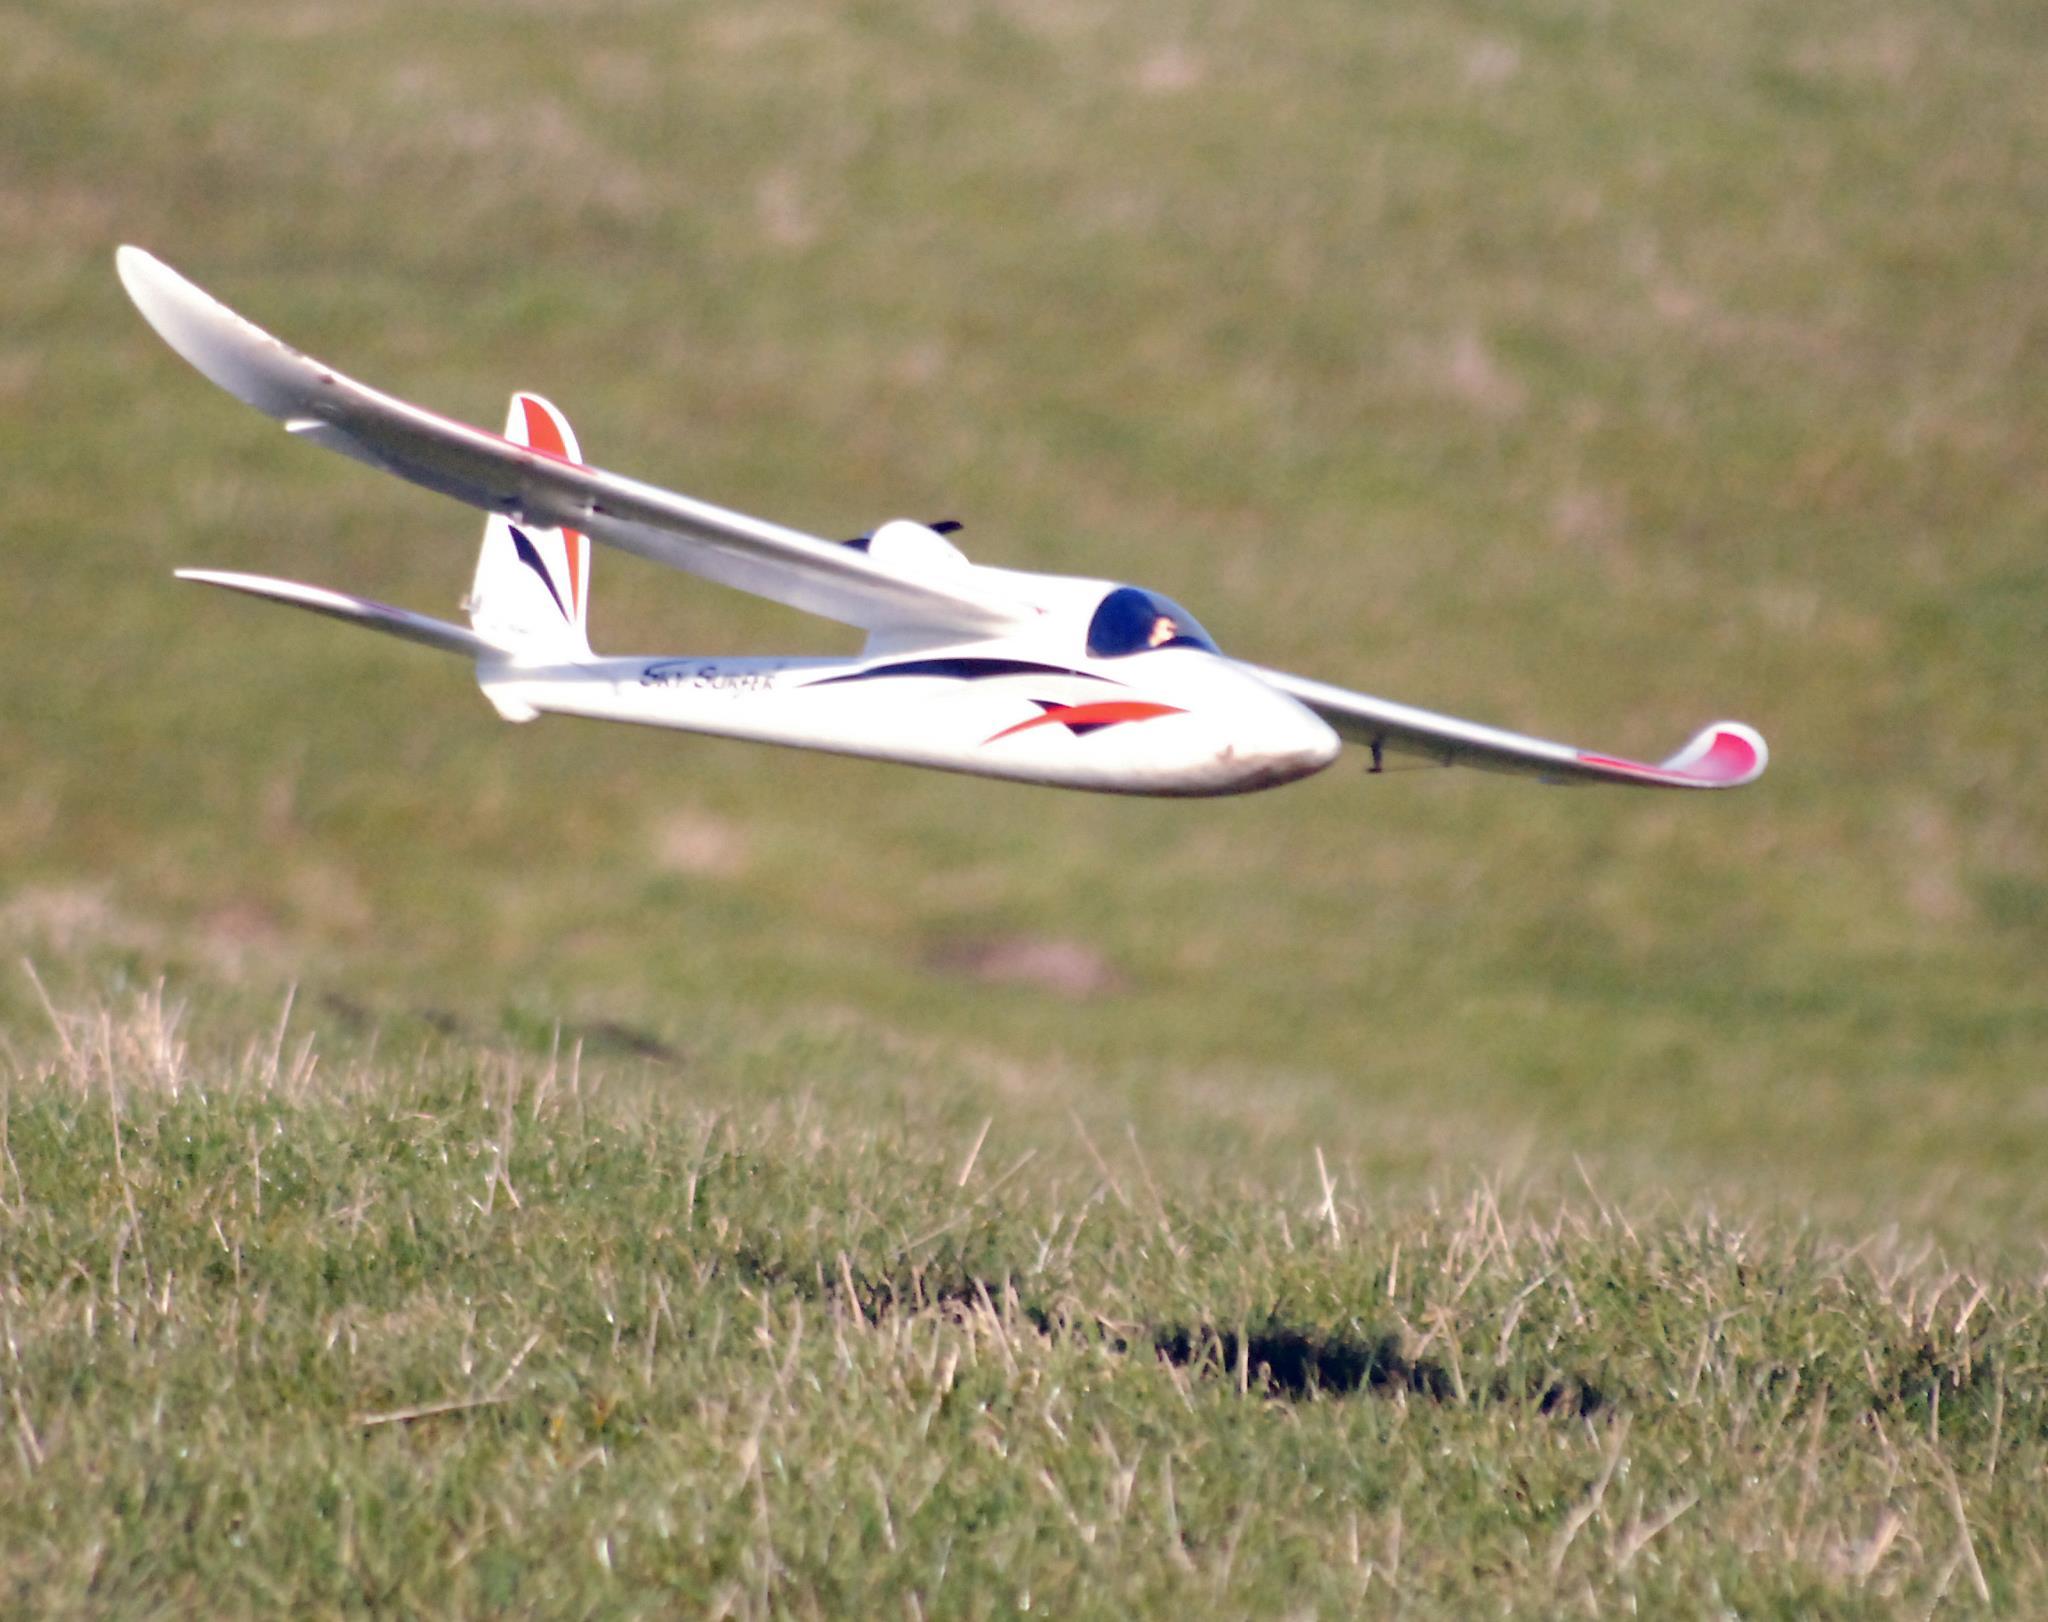 SkySurfer Touchdown (2)